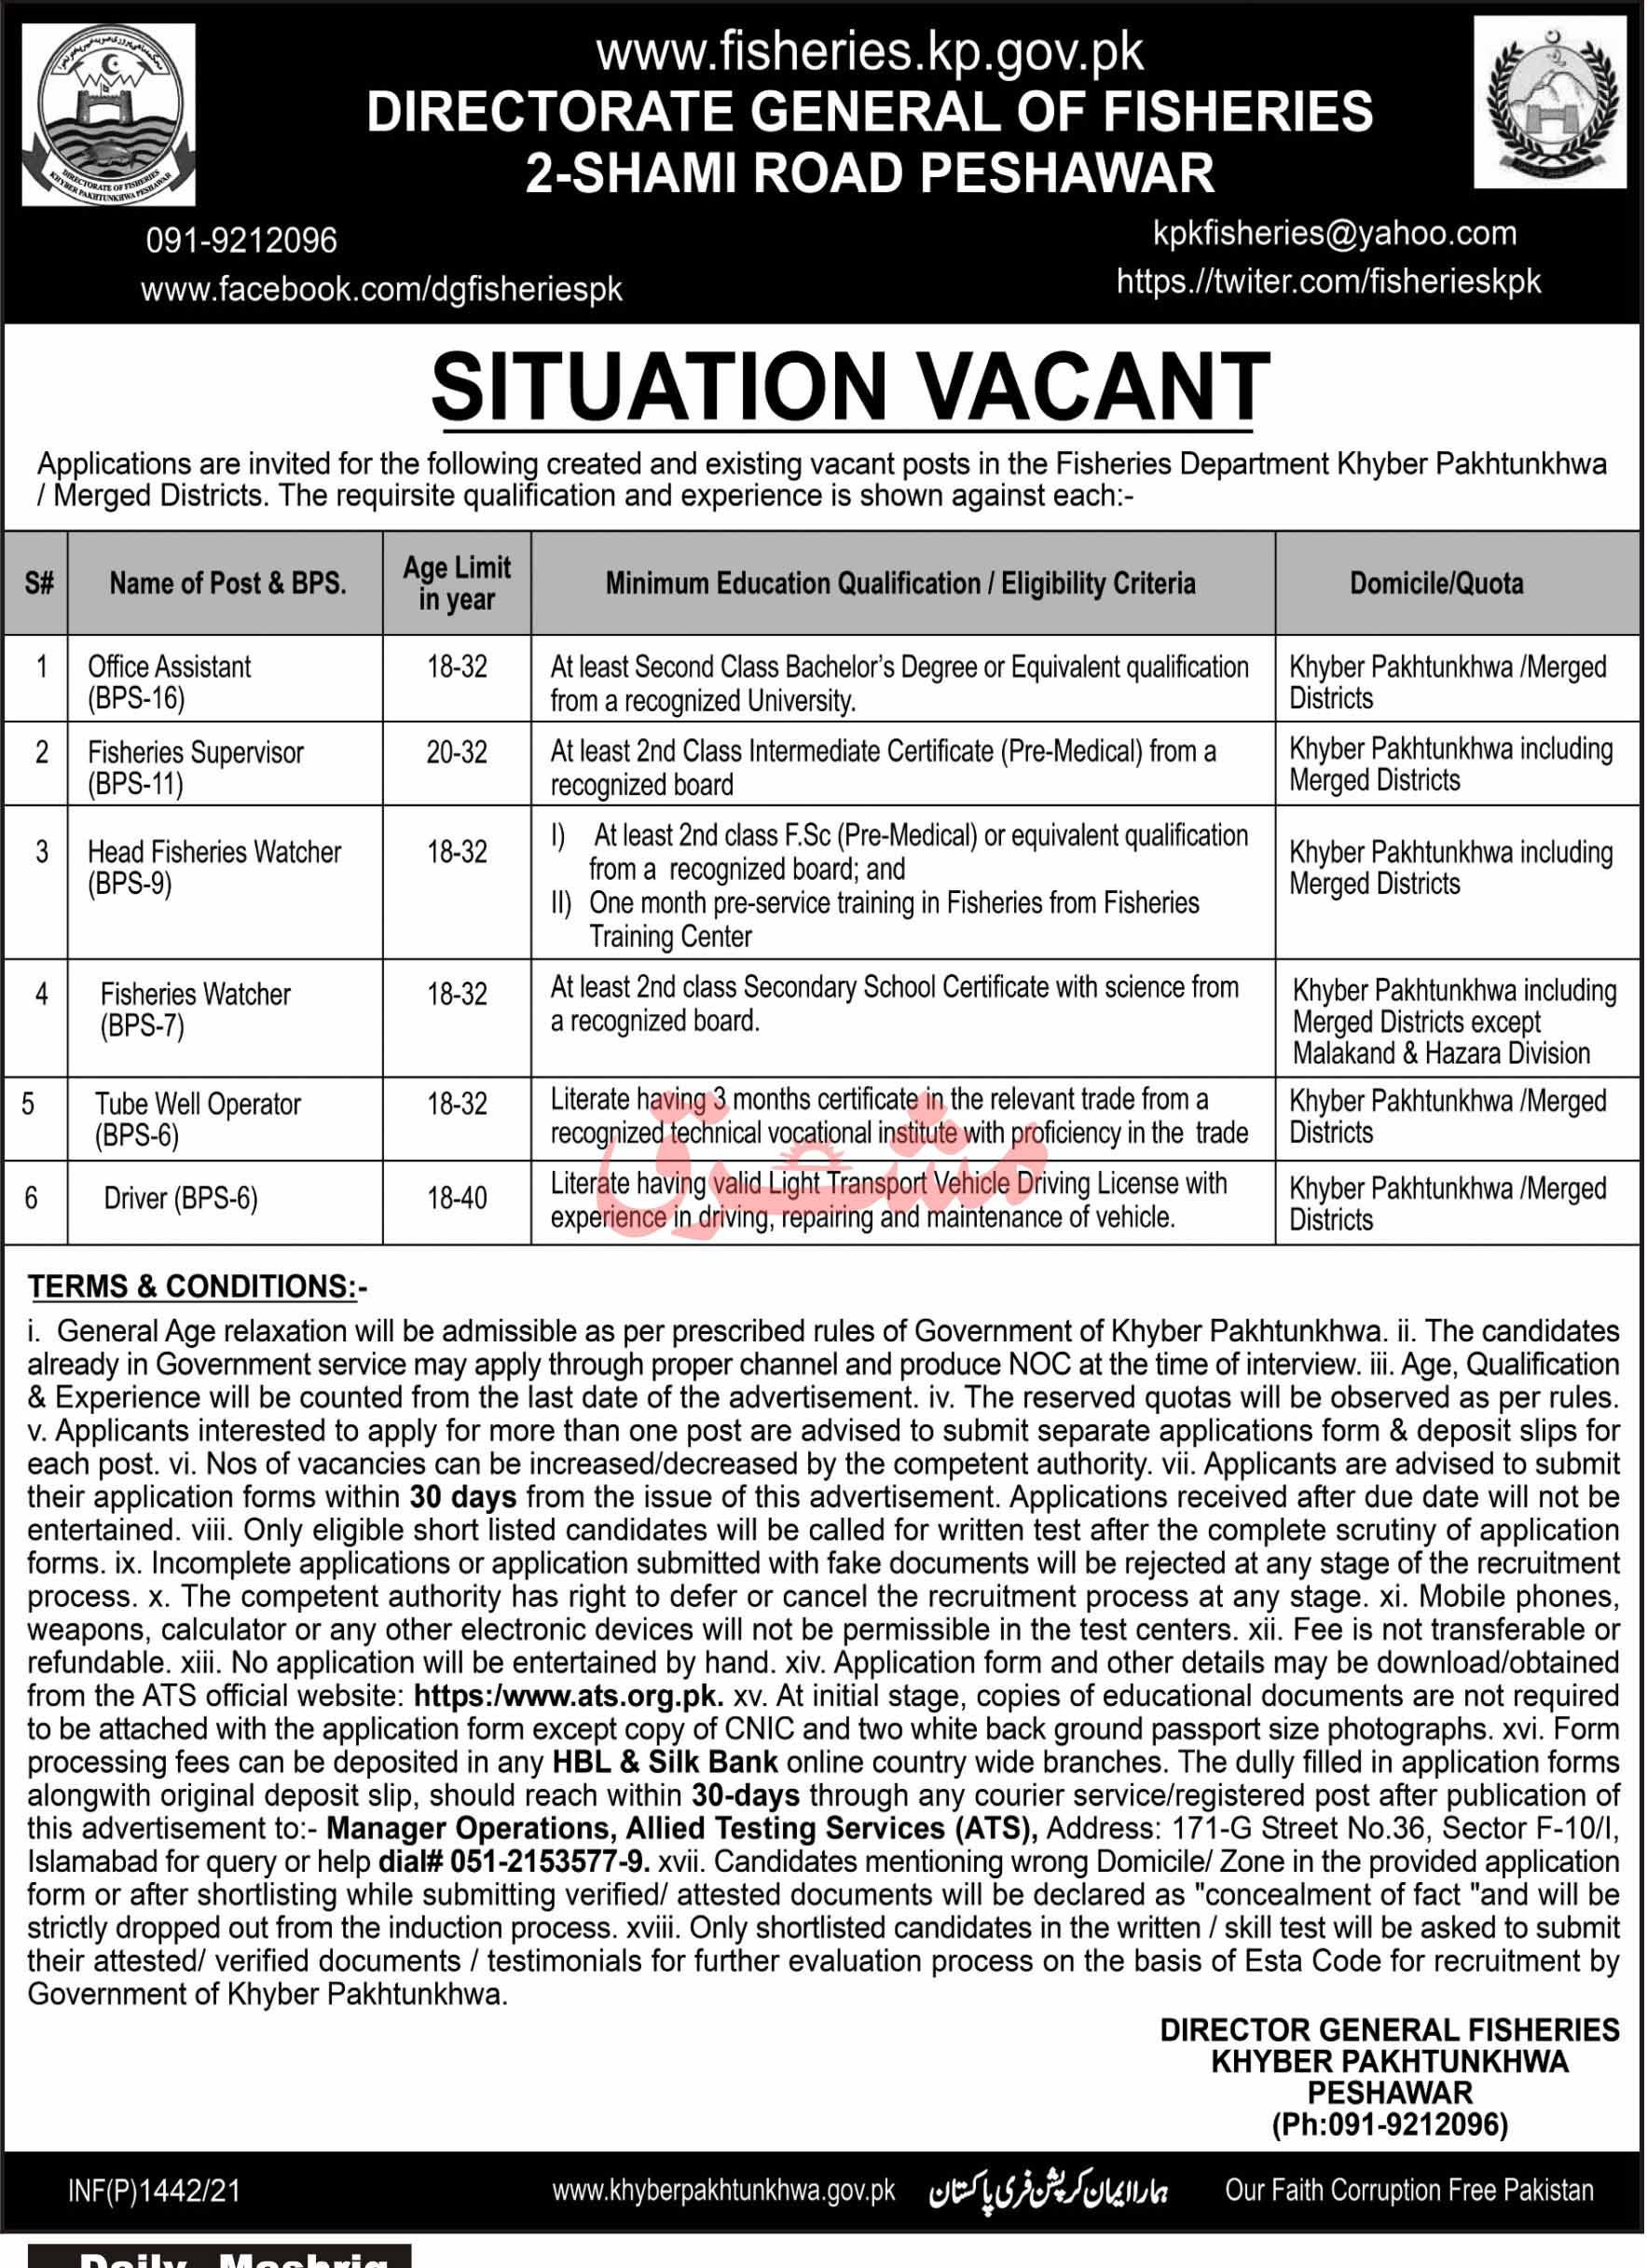 KPK Fisheries Department Peshawar Jobs 2021